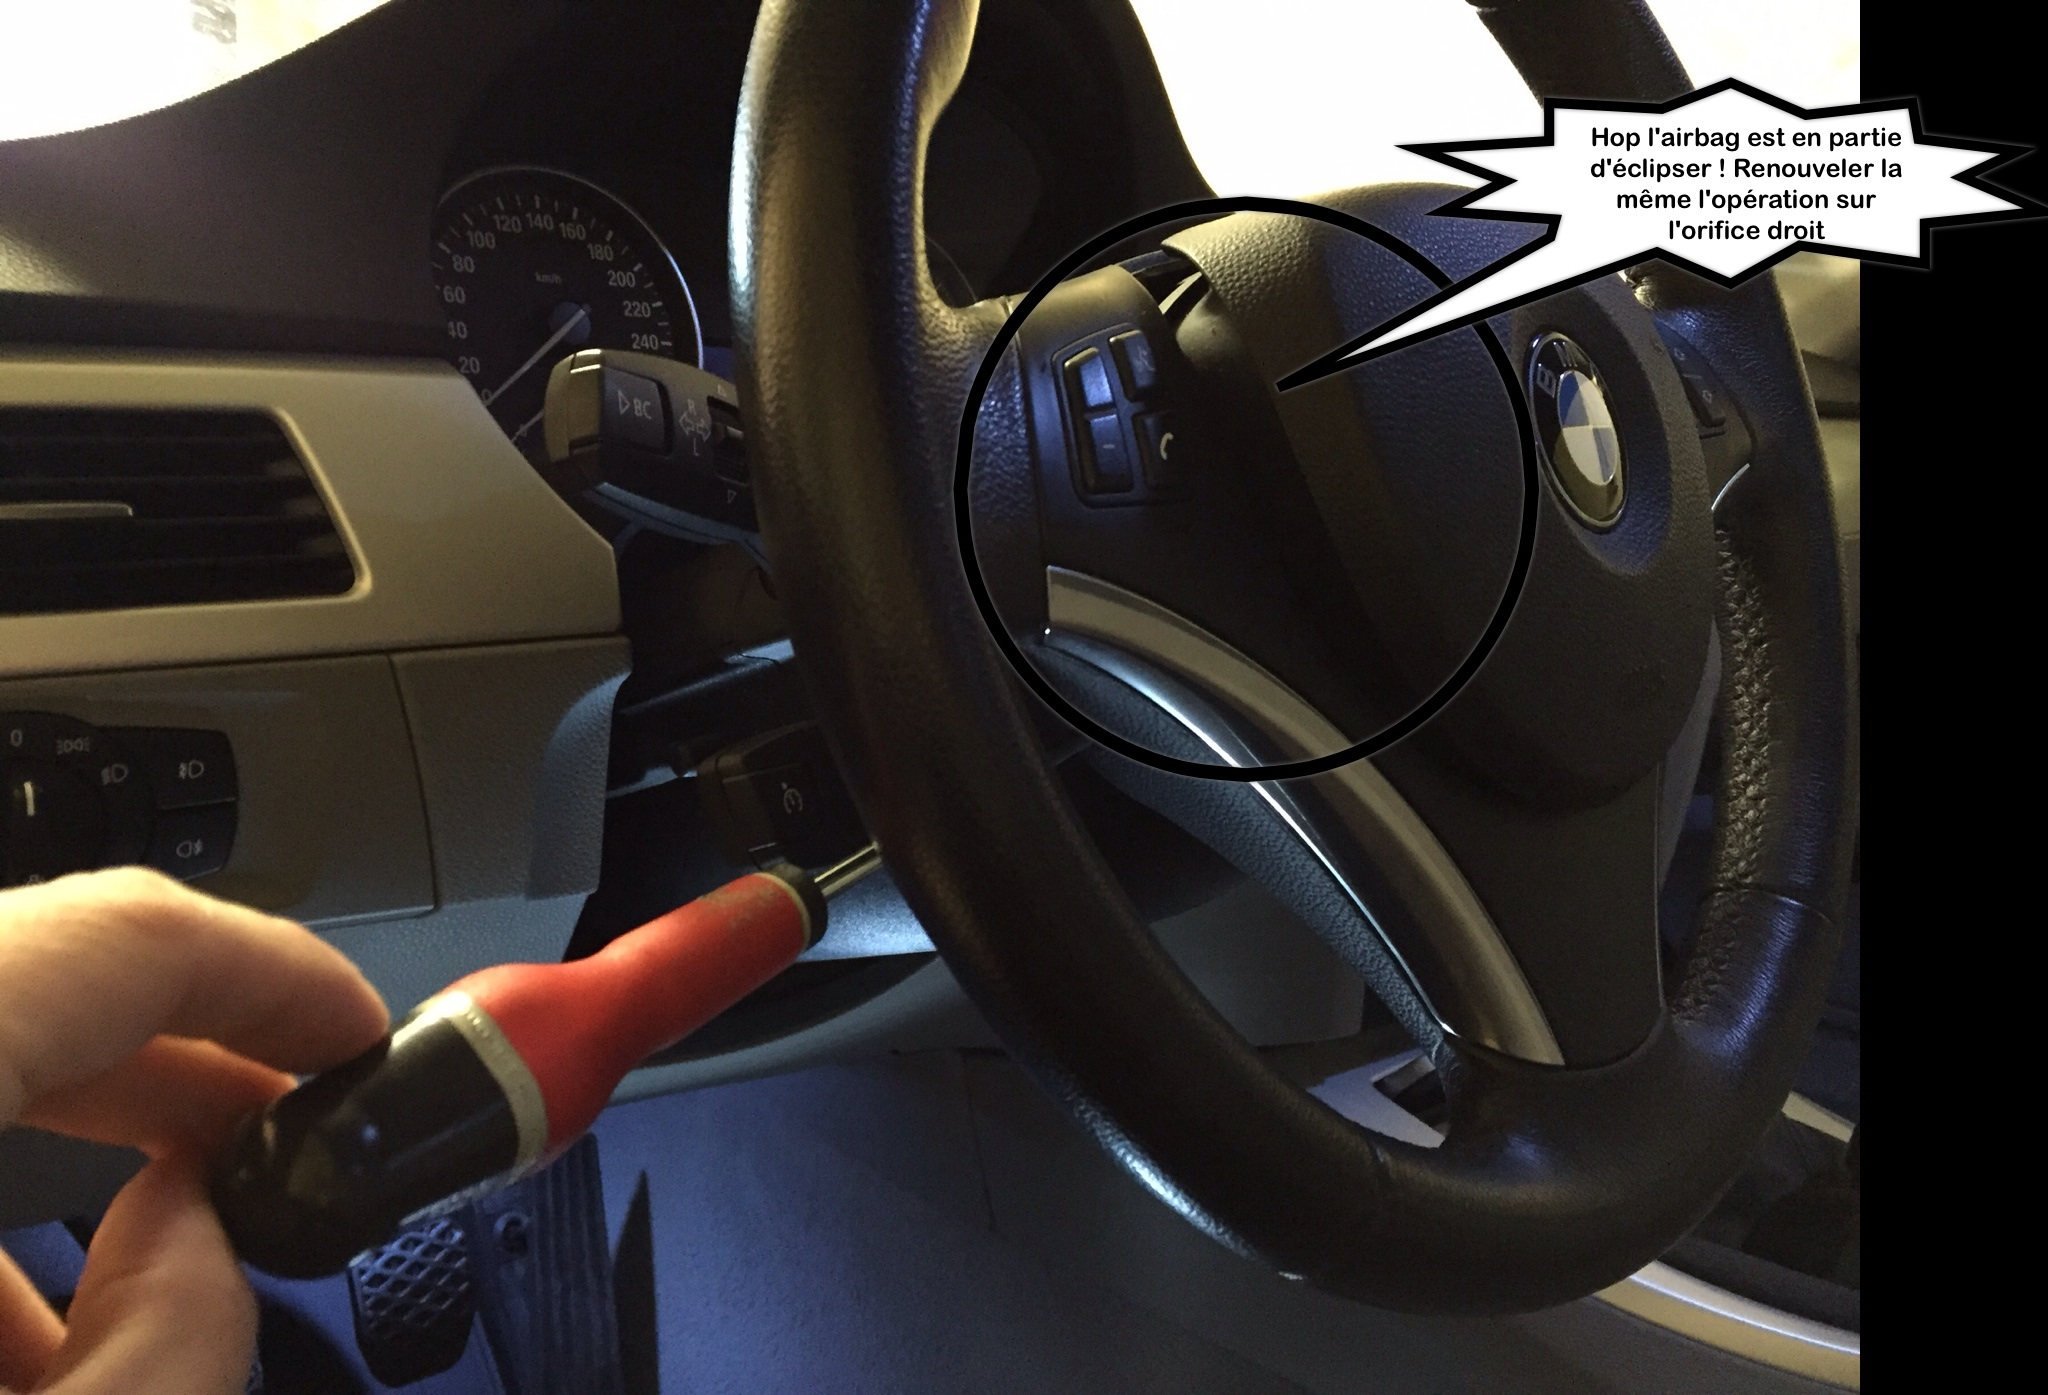 tuto montage insert volant sans d brancher la batterie bmw. Black Bedroom Furniture Sets. Home Design Ideas